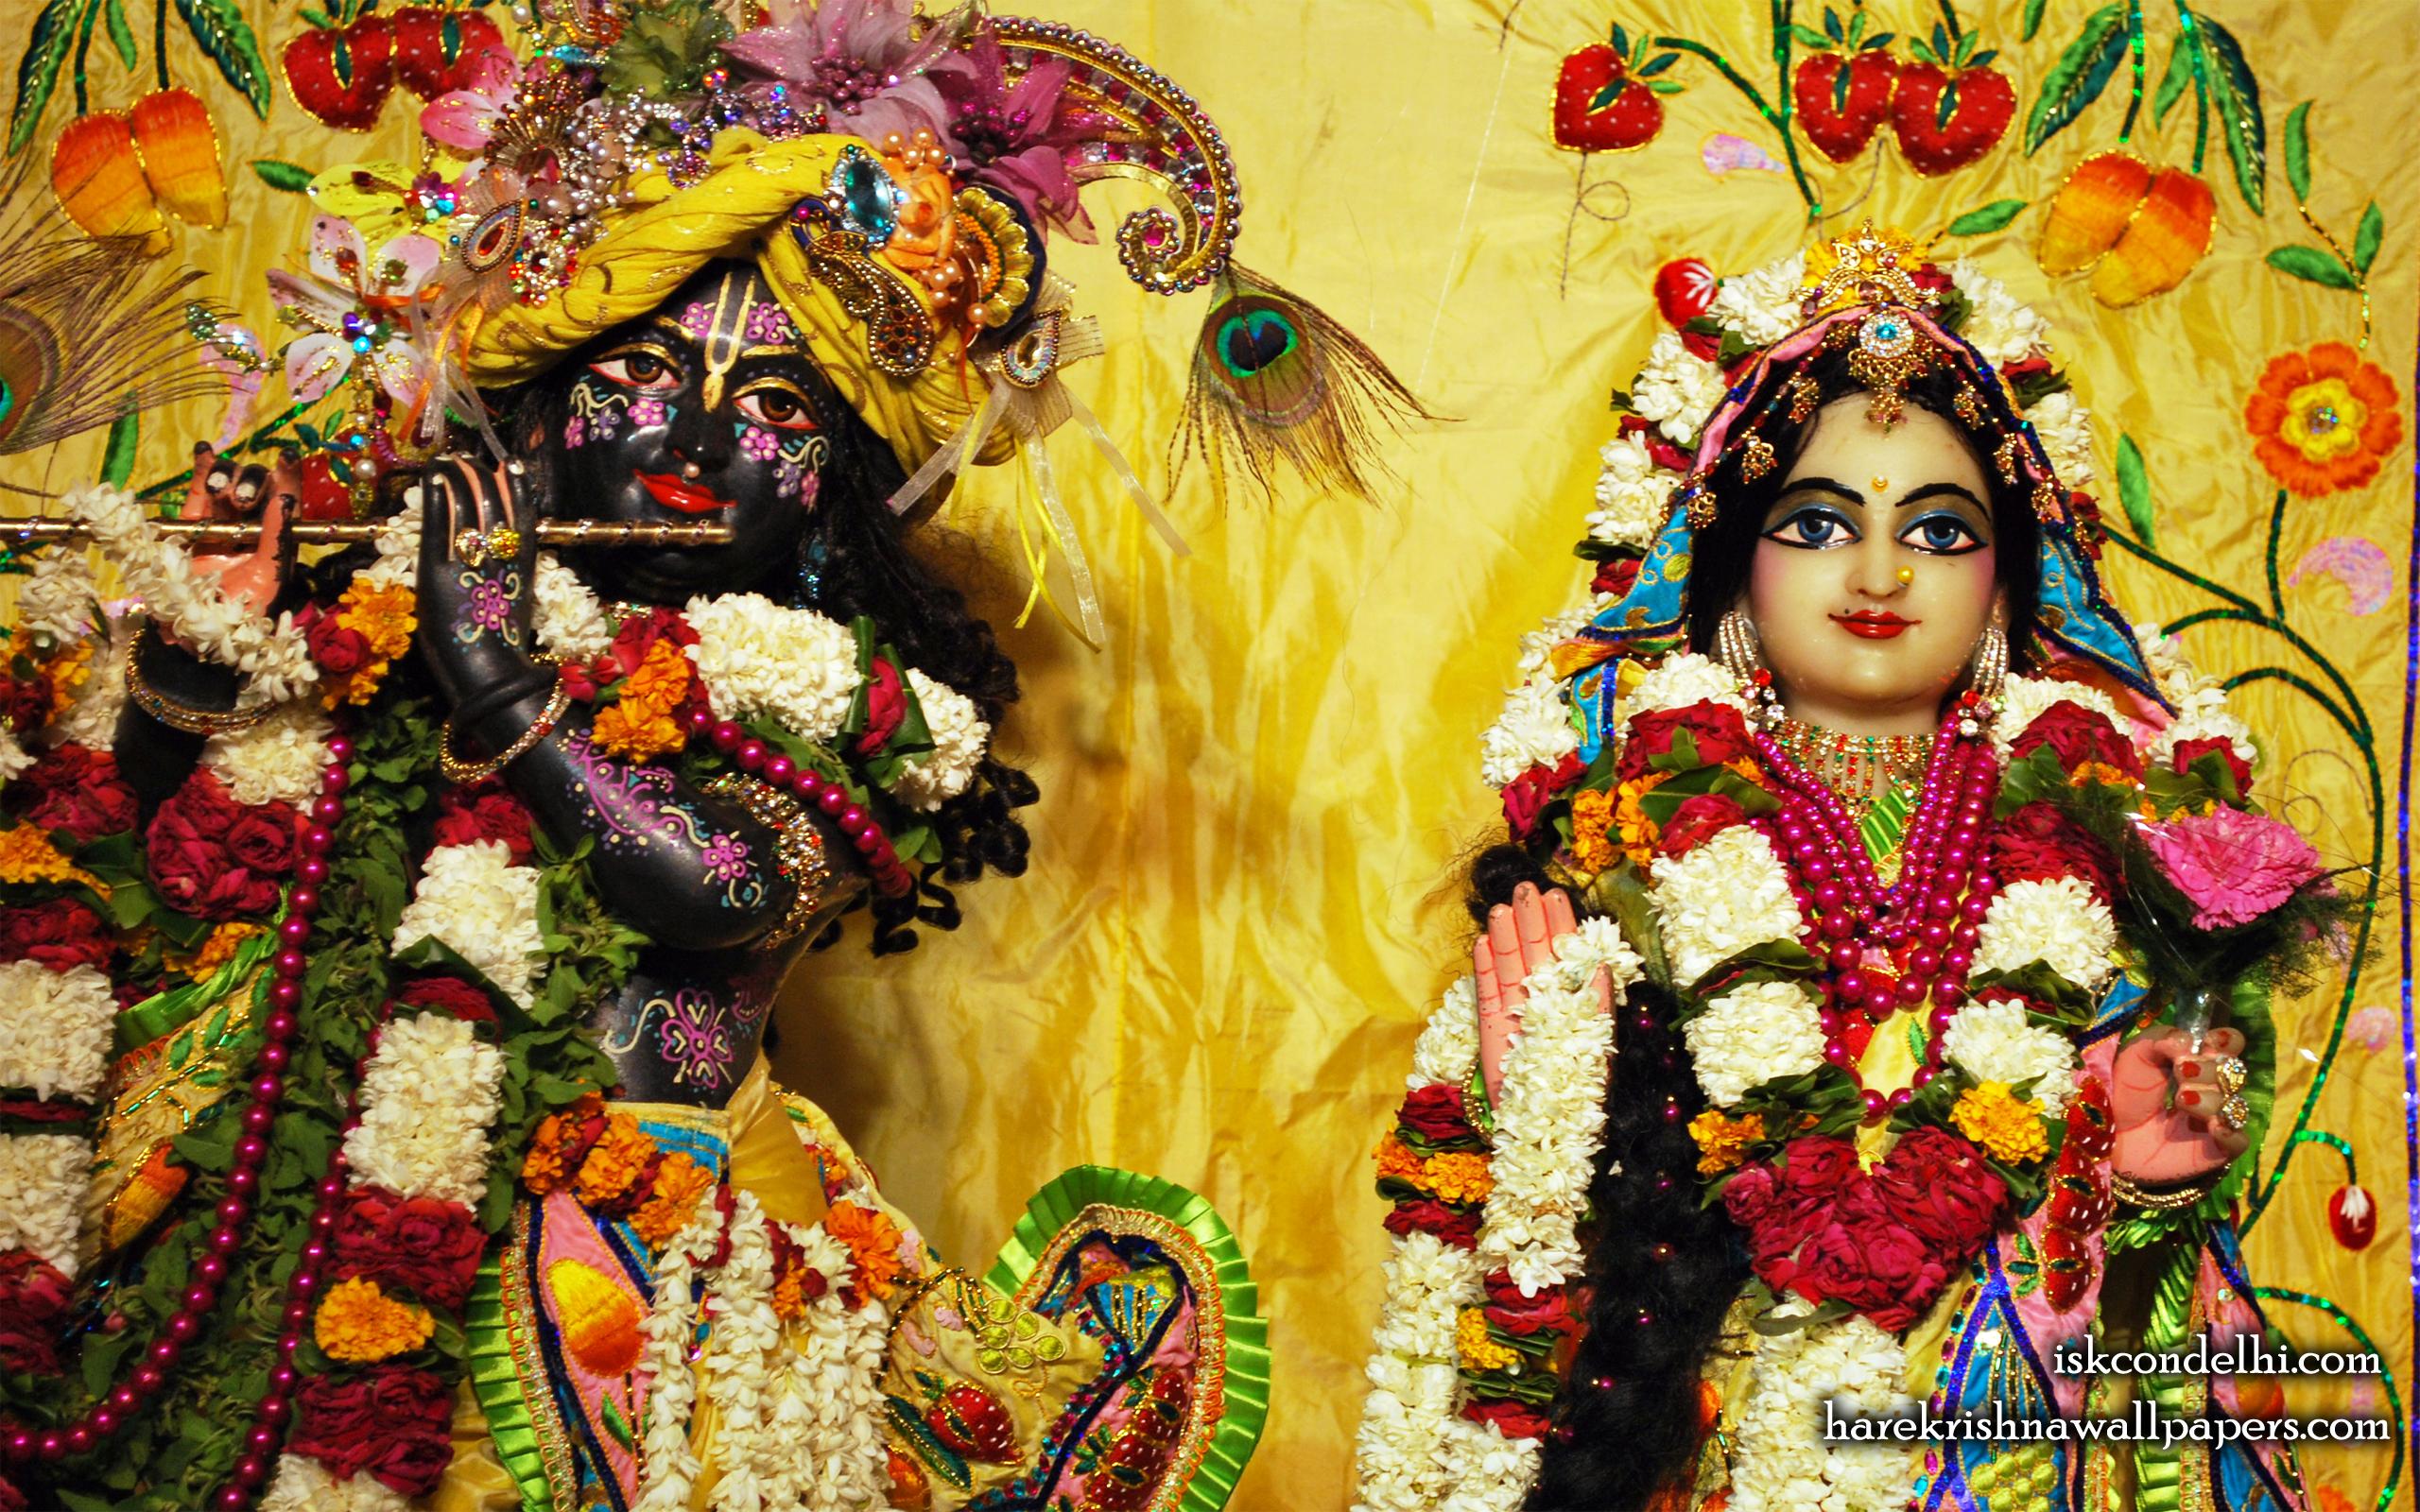 Sri Sri Radha Parthasarathi Close up Wallpaper (011) Size 2560x1600 Download